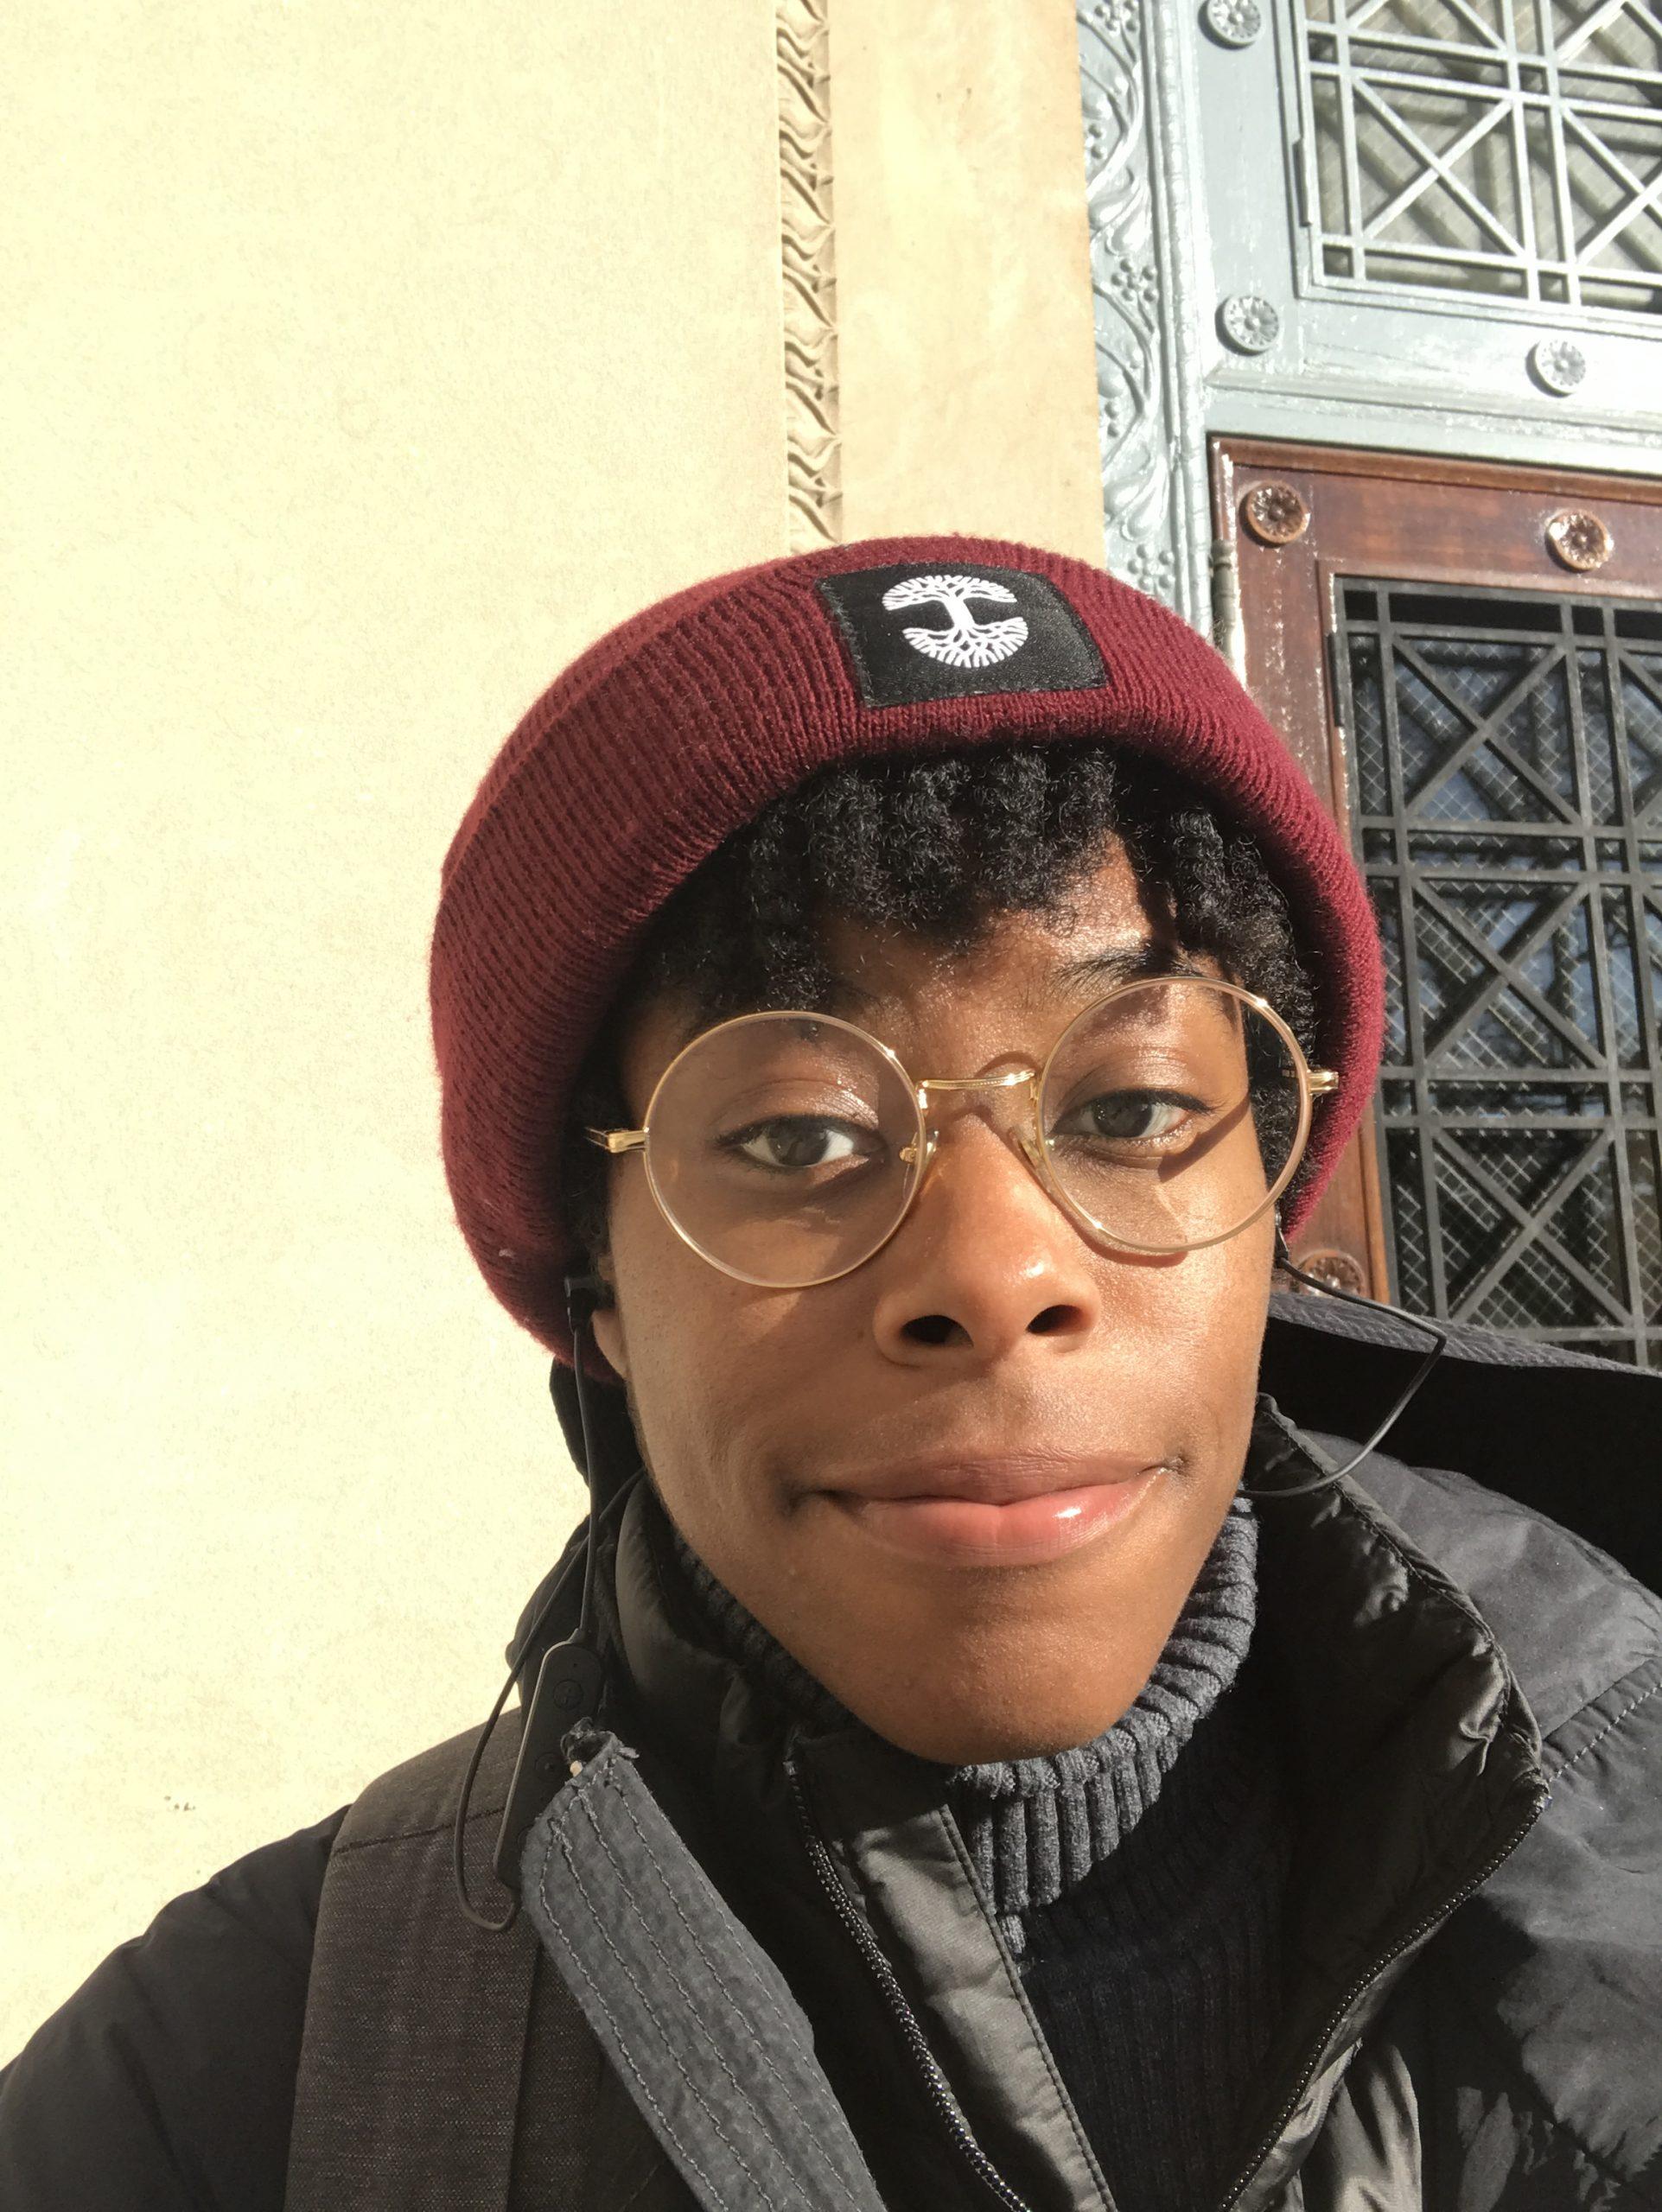 Tutor for Algebra Calculus Engineering Chemistry